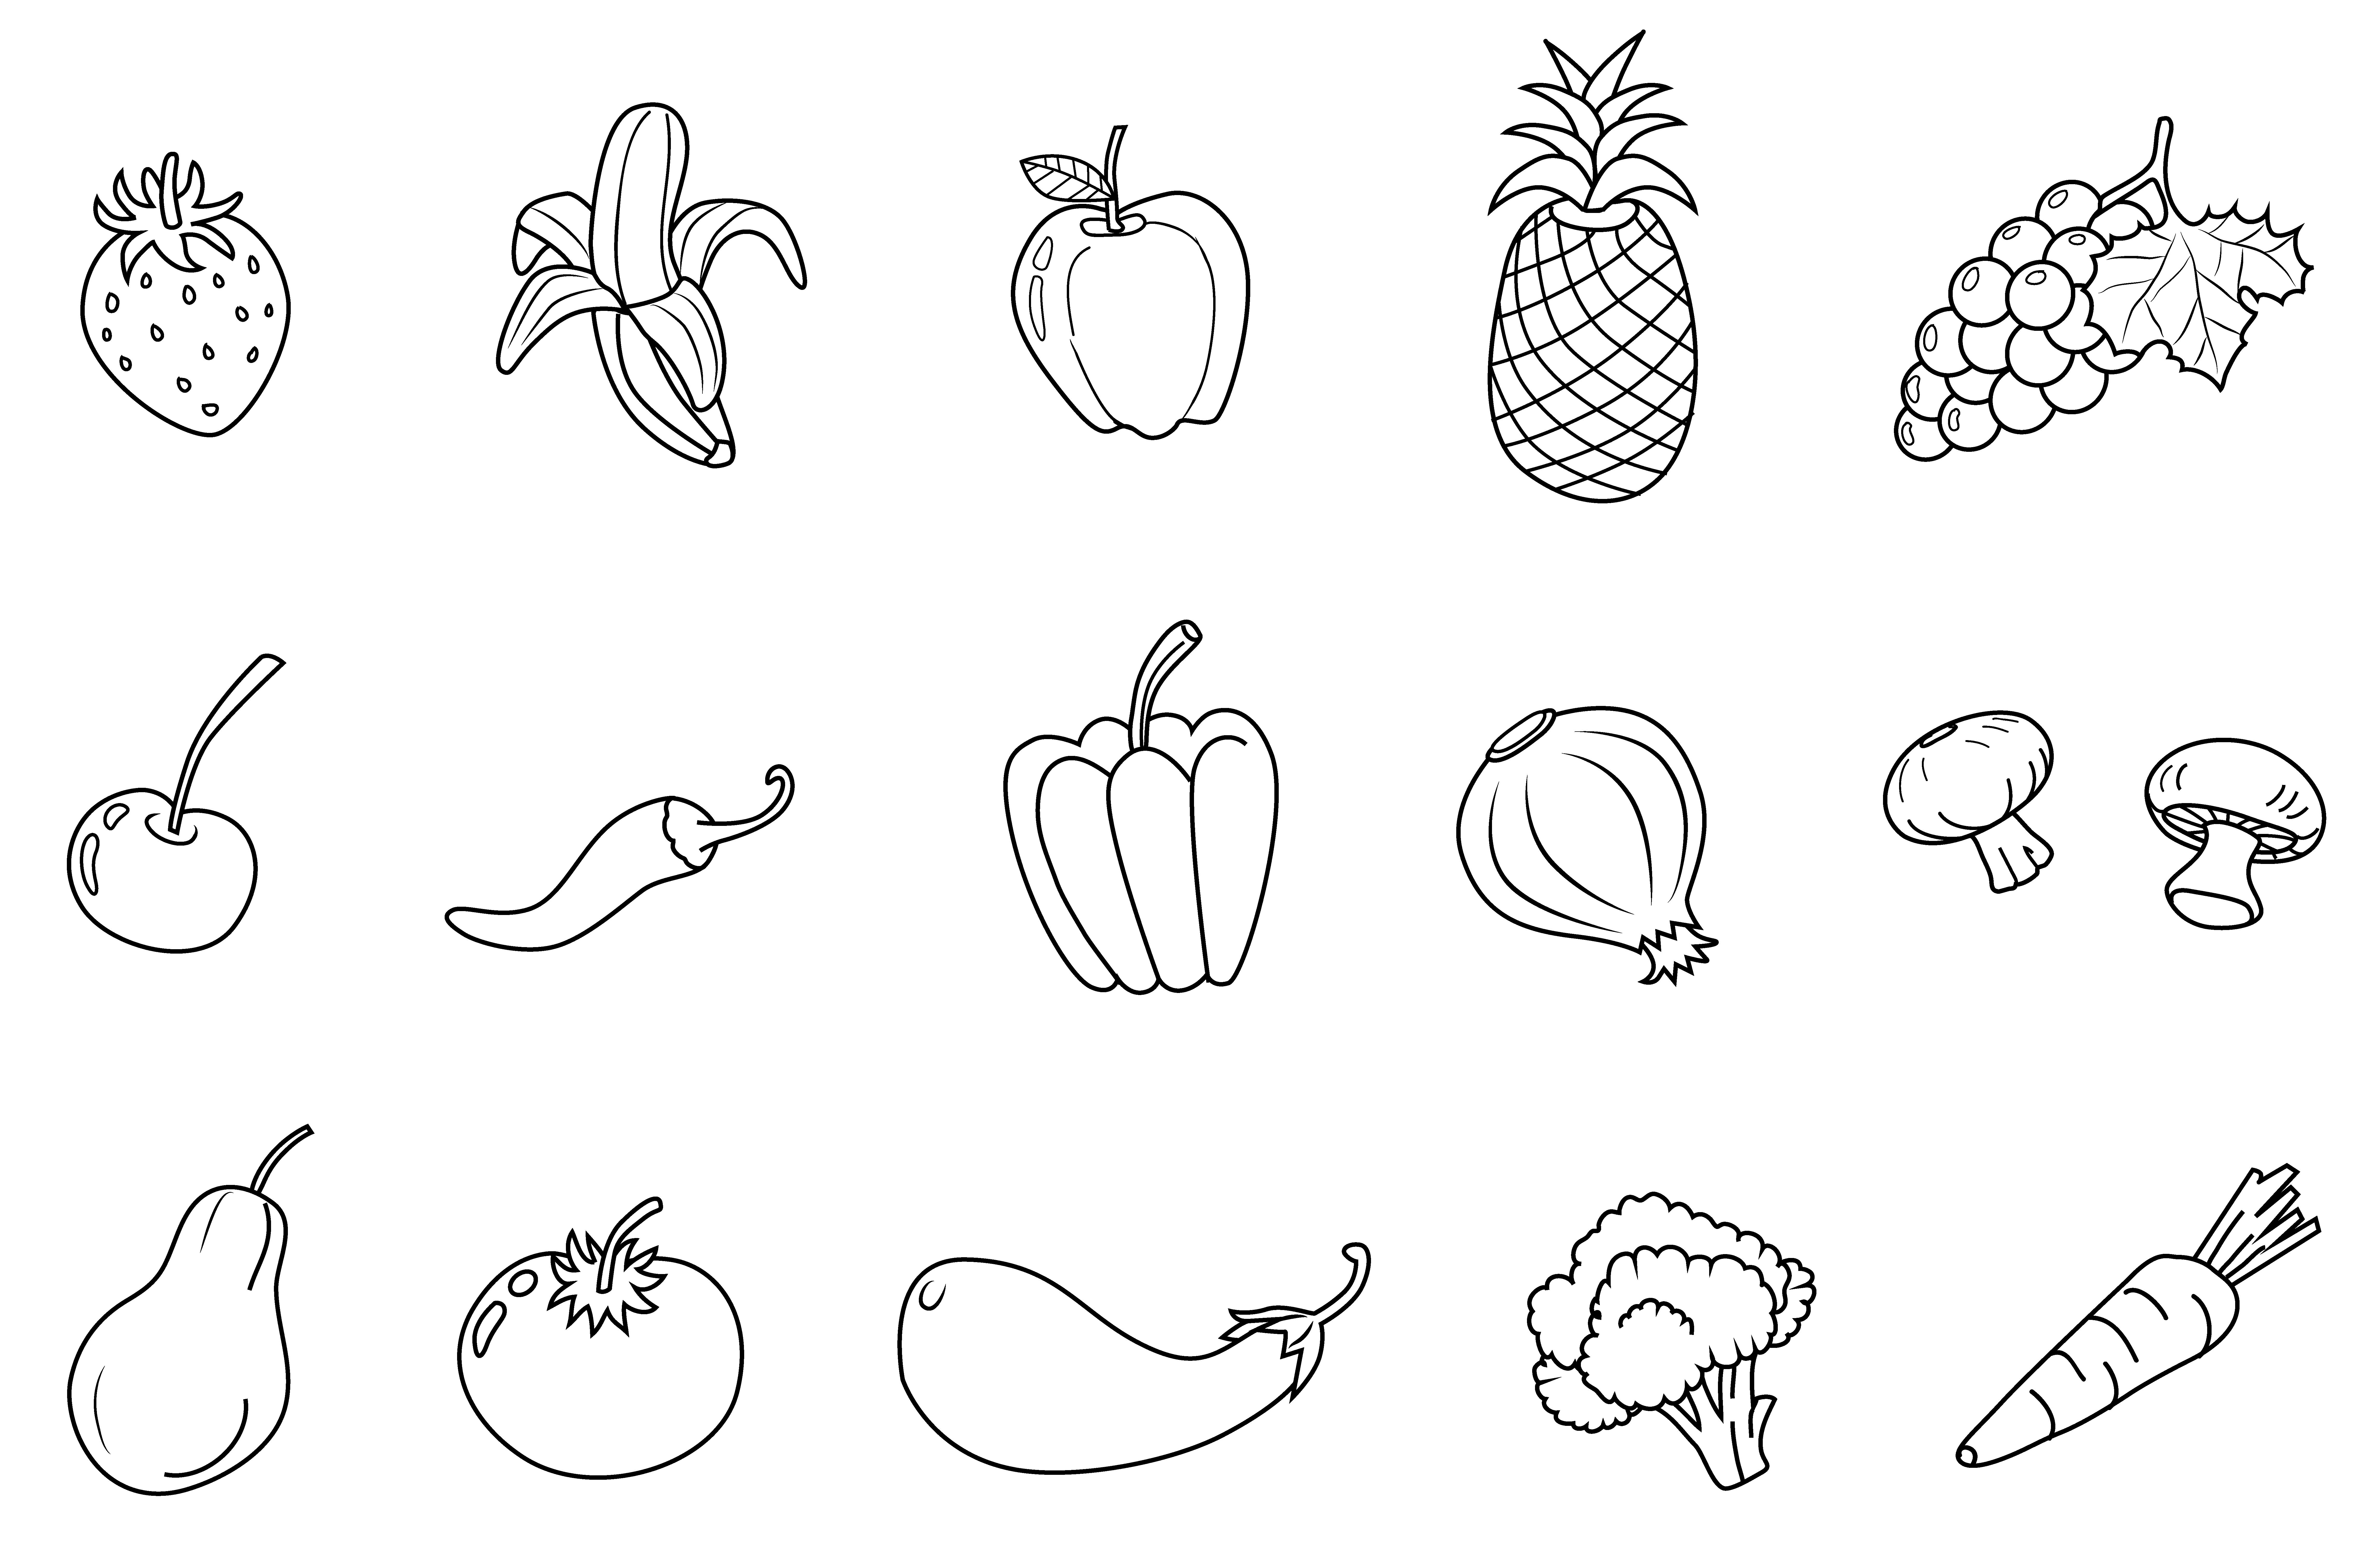 Vegetables Clipart Black And White – Gclipart com